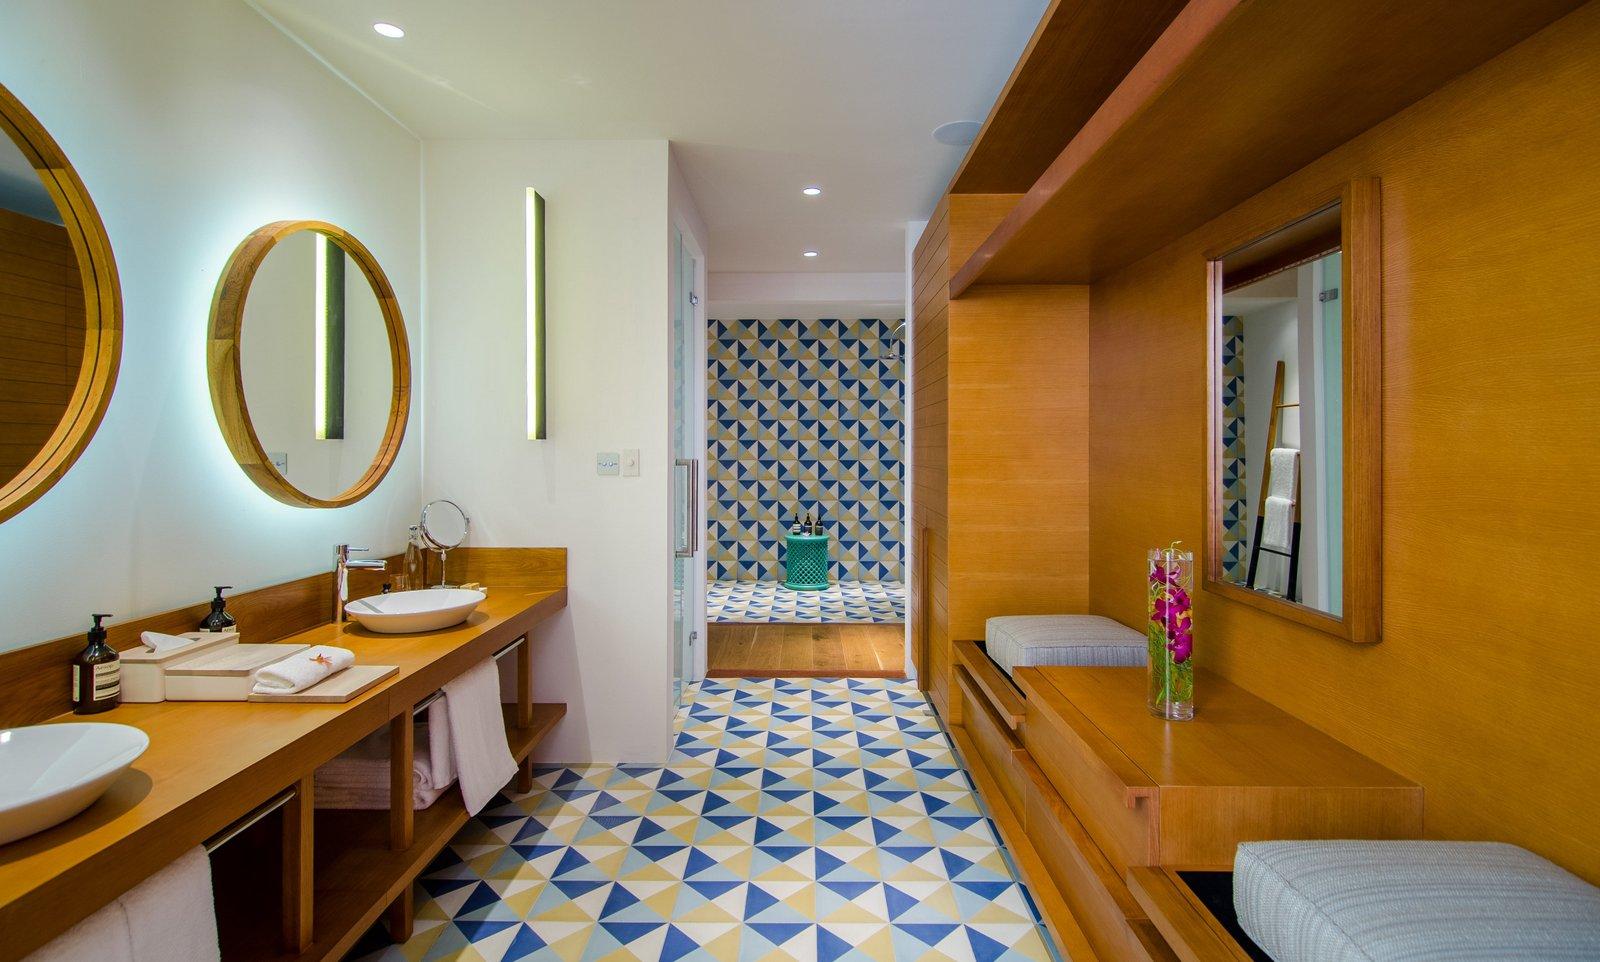 Мальдивы, Отель Amilla Fushi Maldives, номер The Great Beach Residence